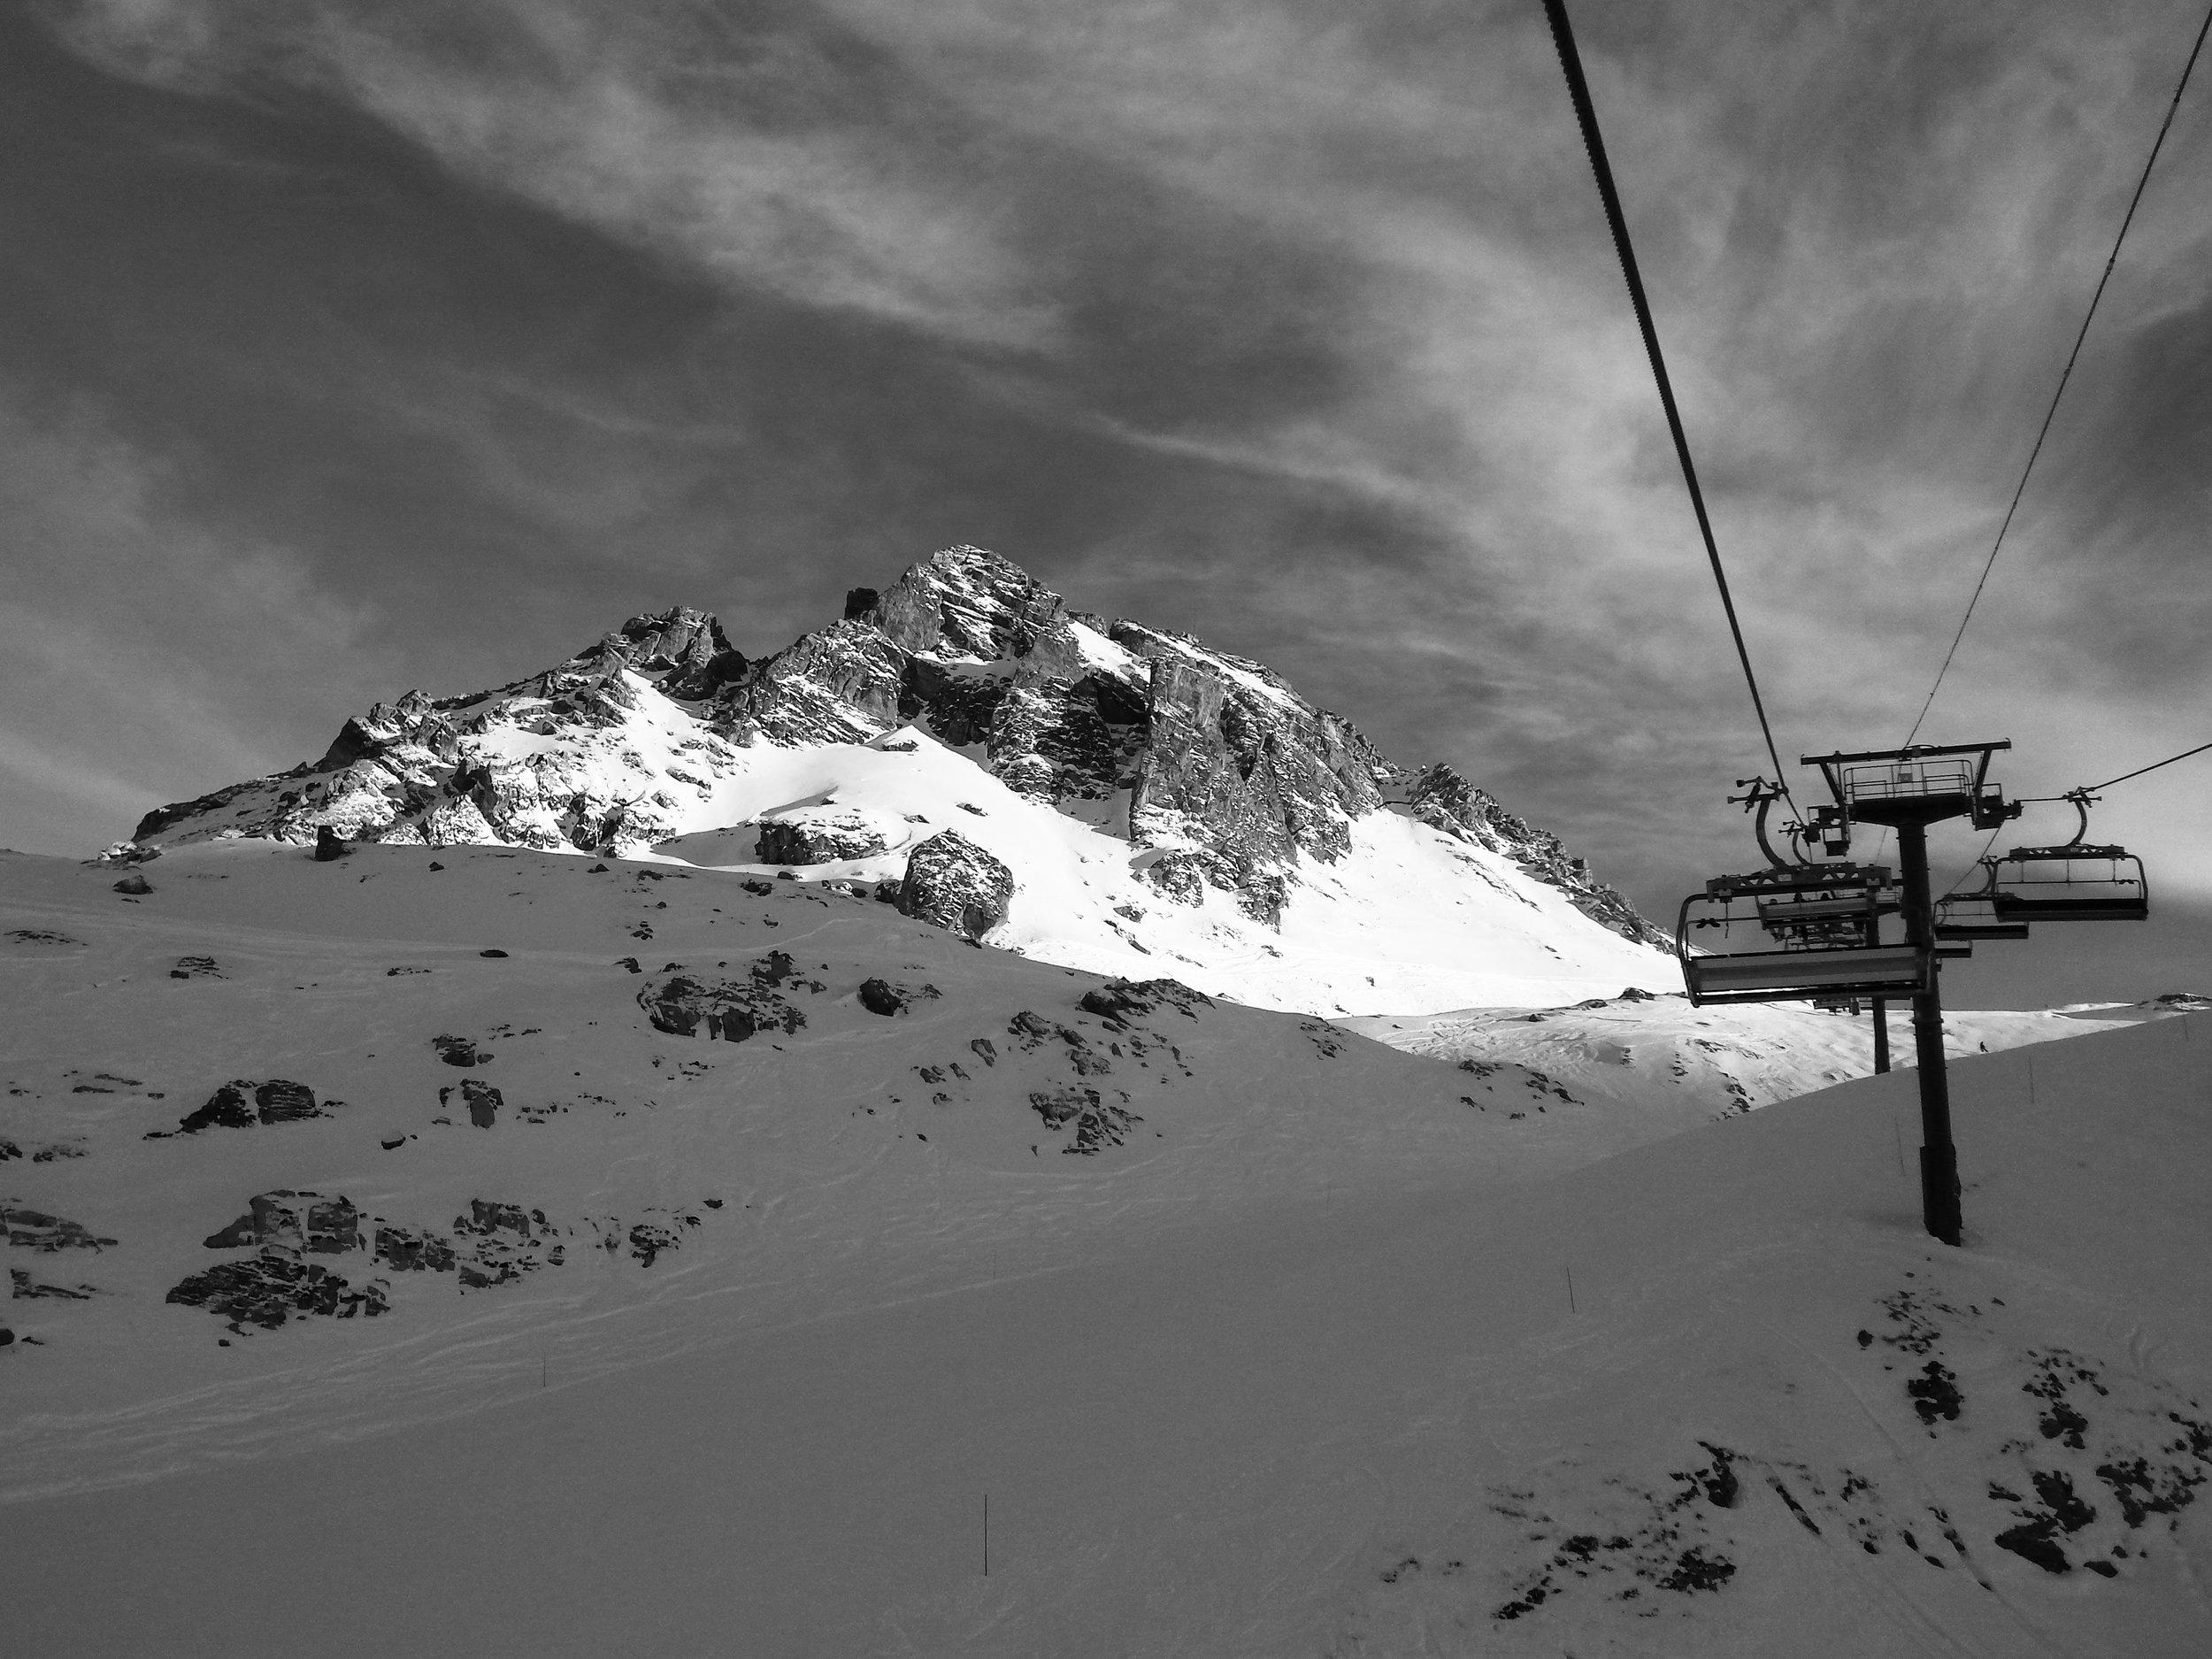 162813-val-d'Isère-snowboarding-ucpa.jpg